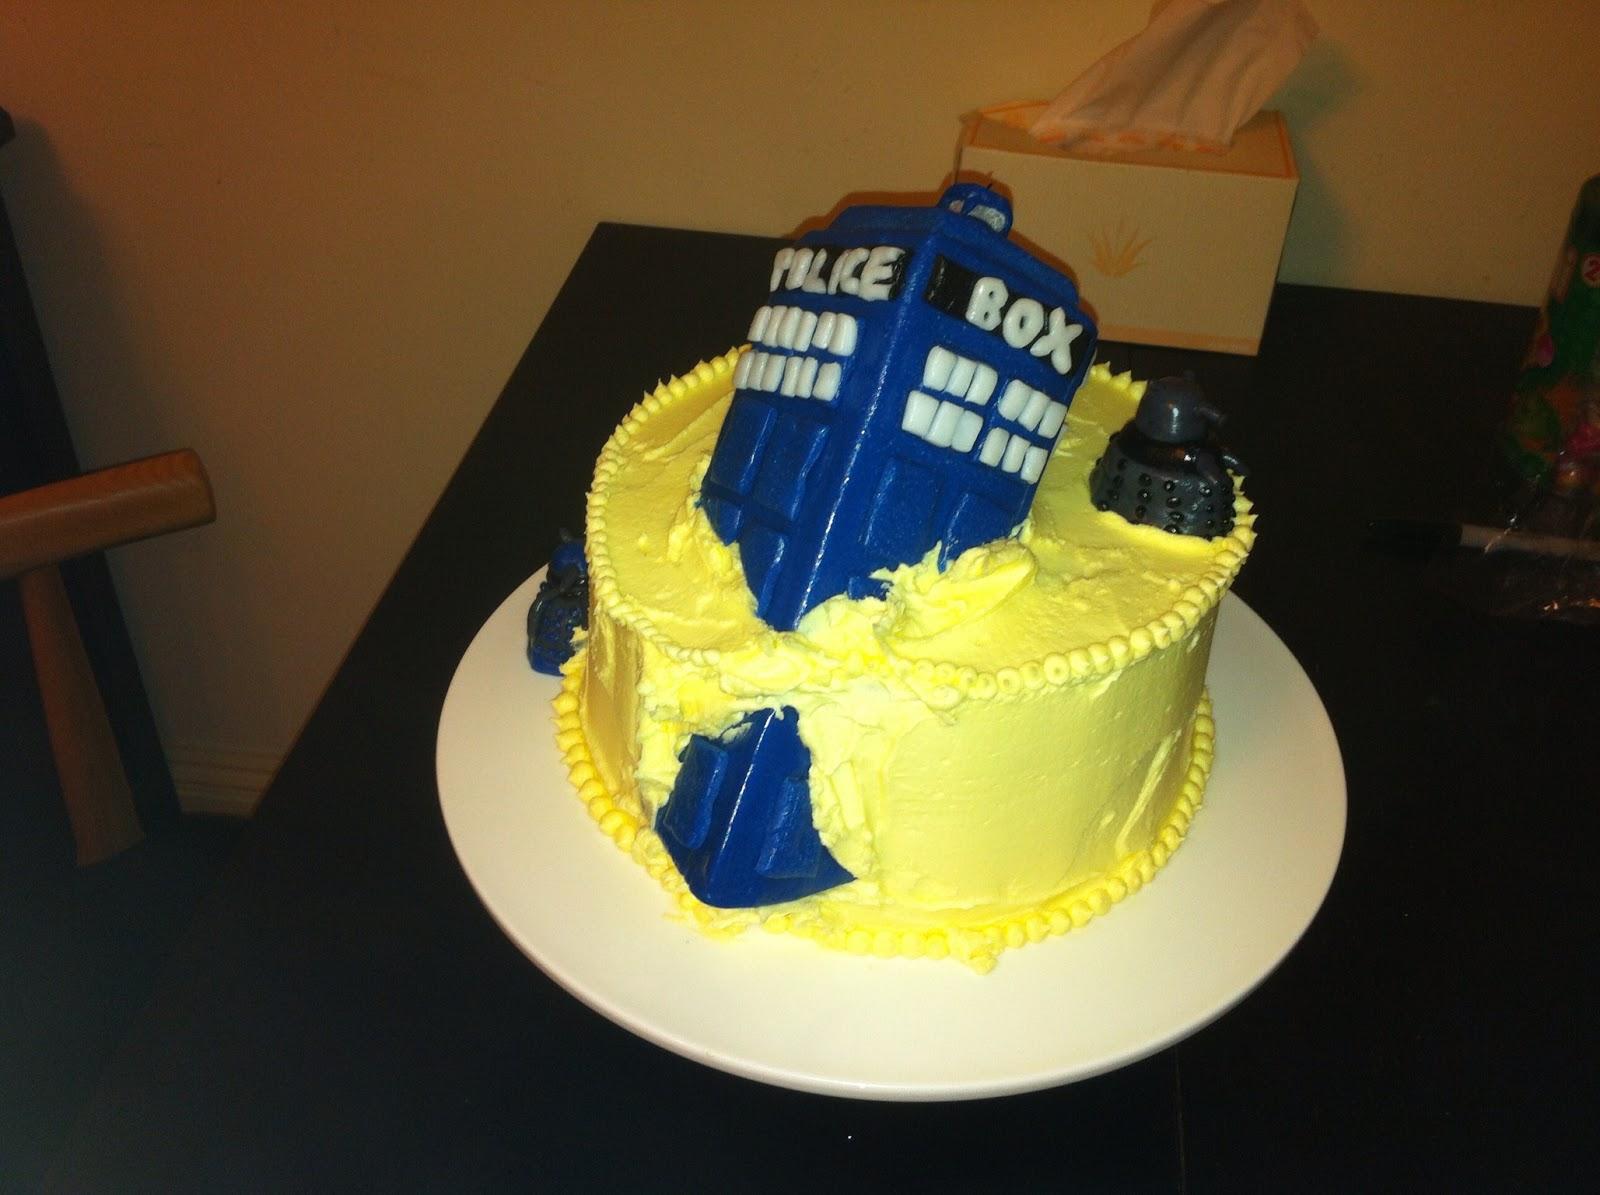 Vanilla Gorilla Doctor Who Cake